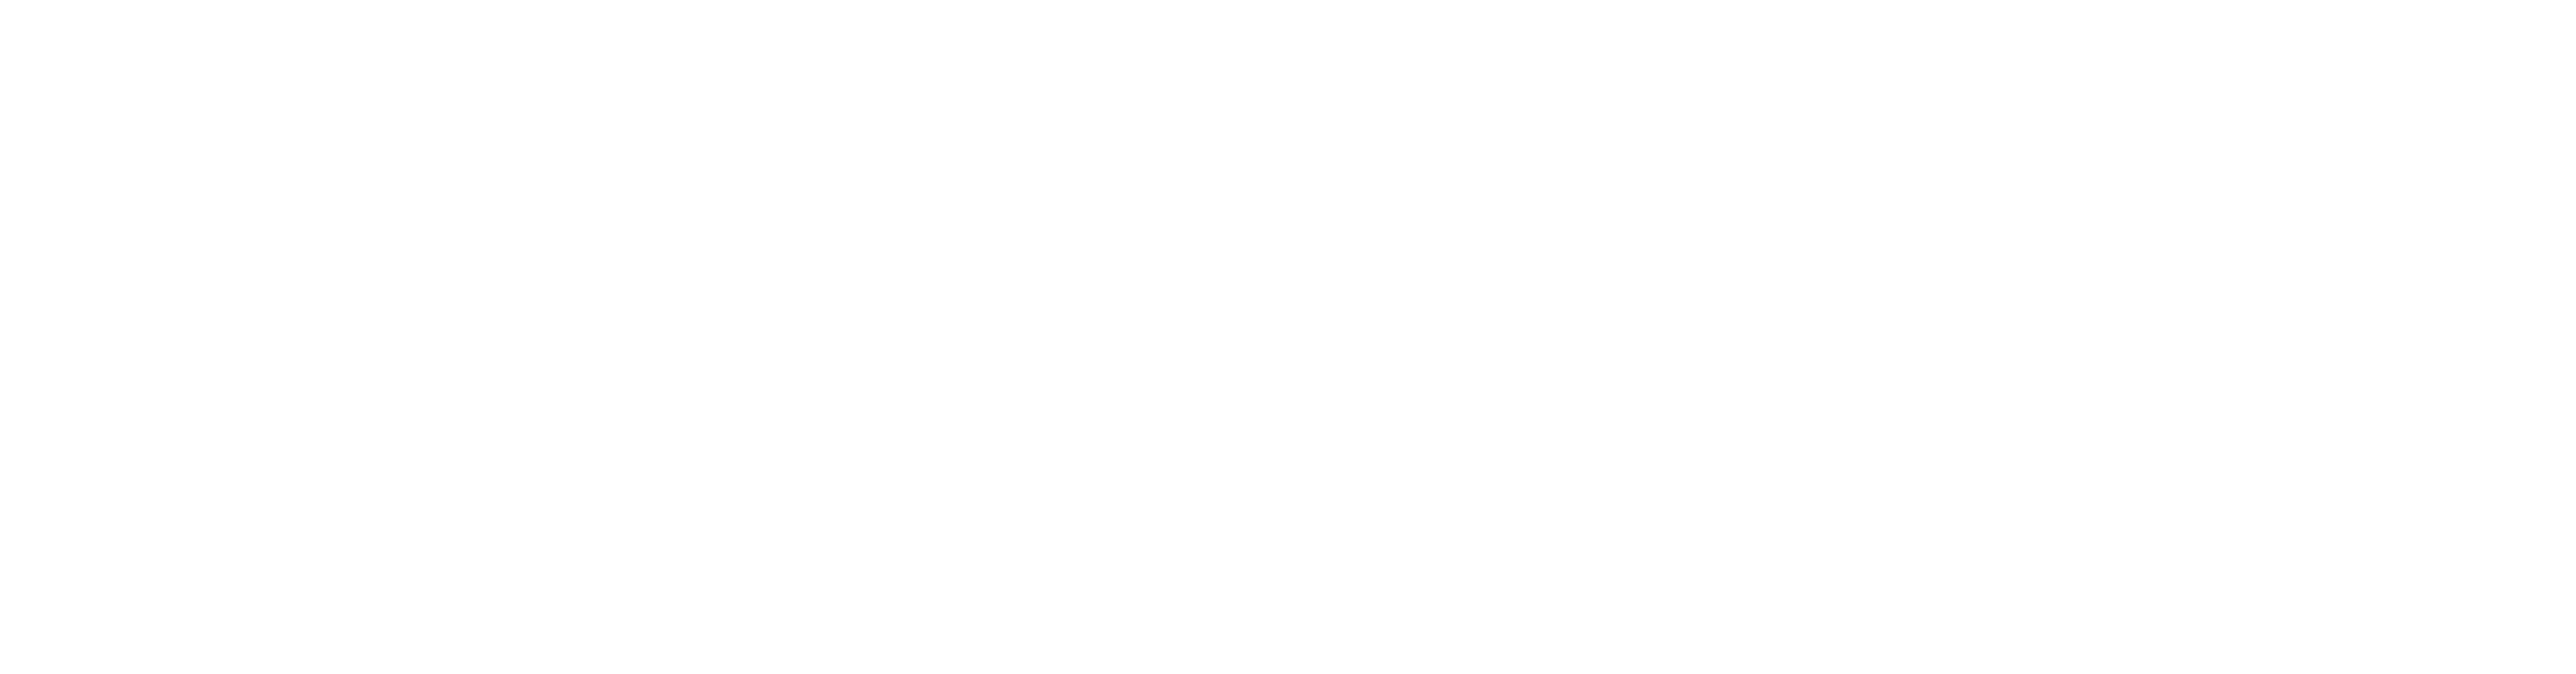 Clemens Krendl Physiotherapie